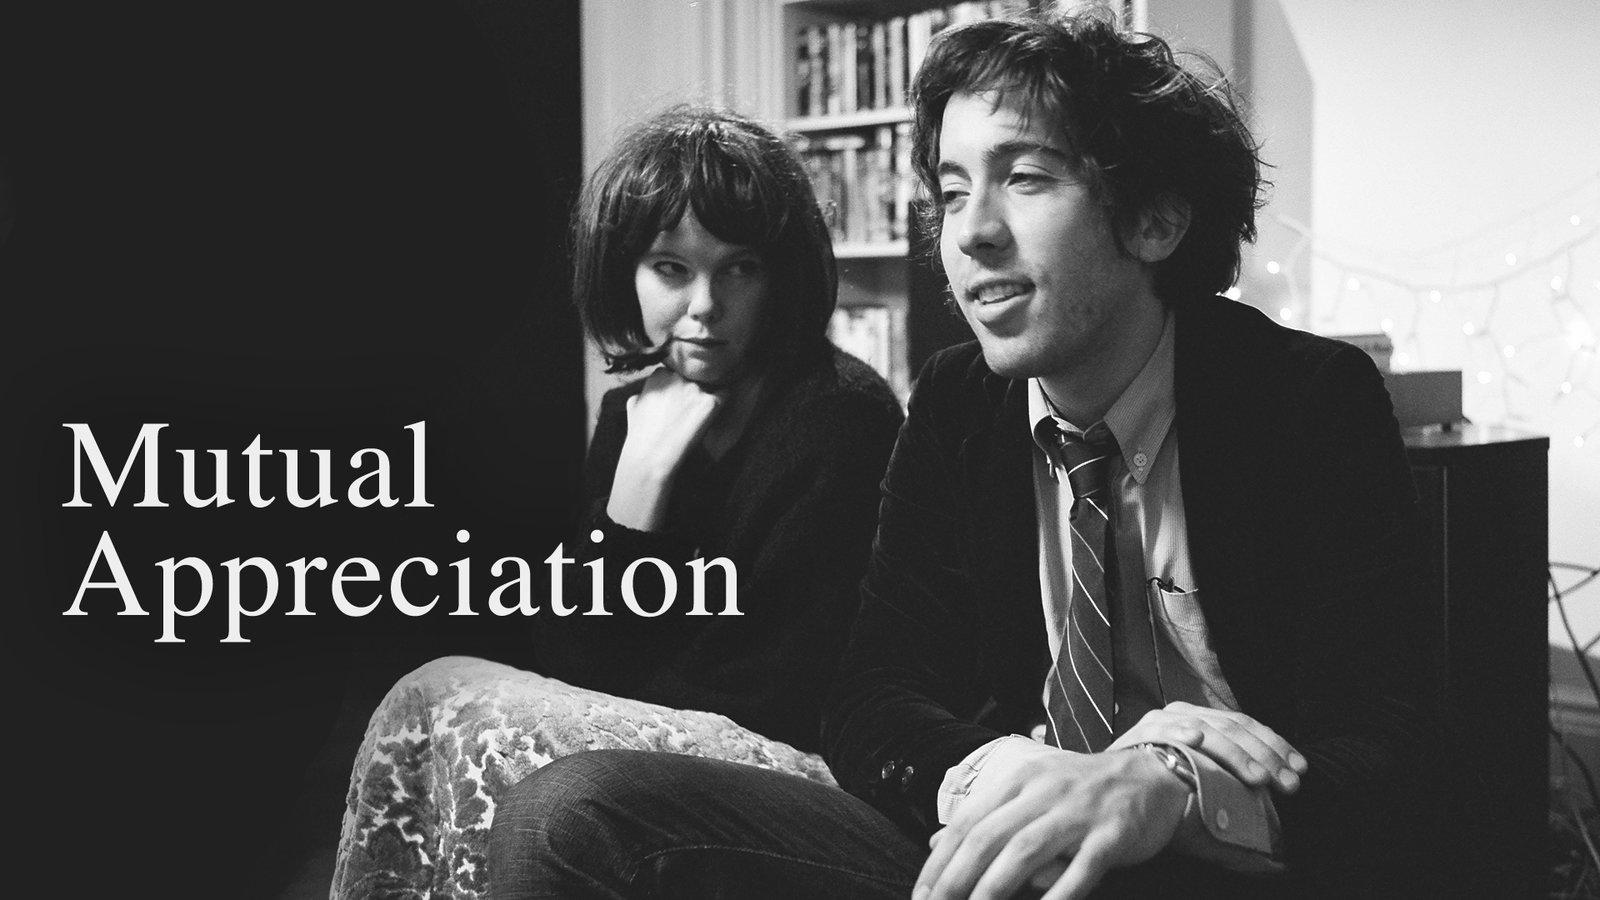 Mutual Appreciation